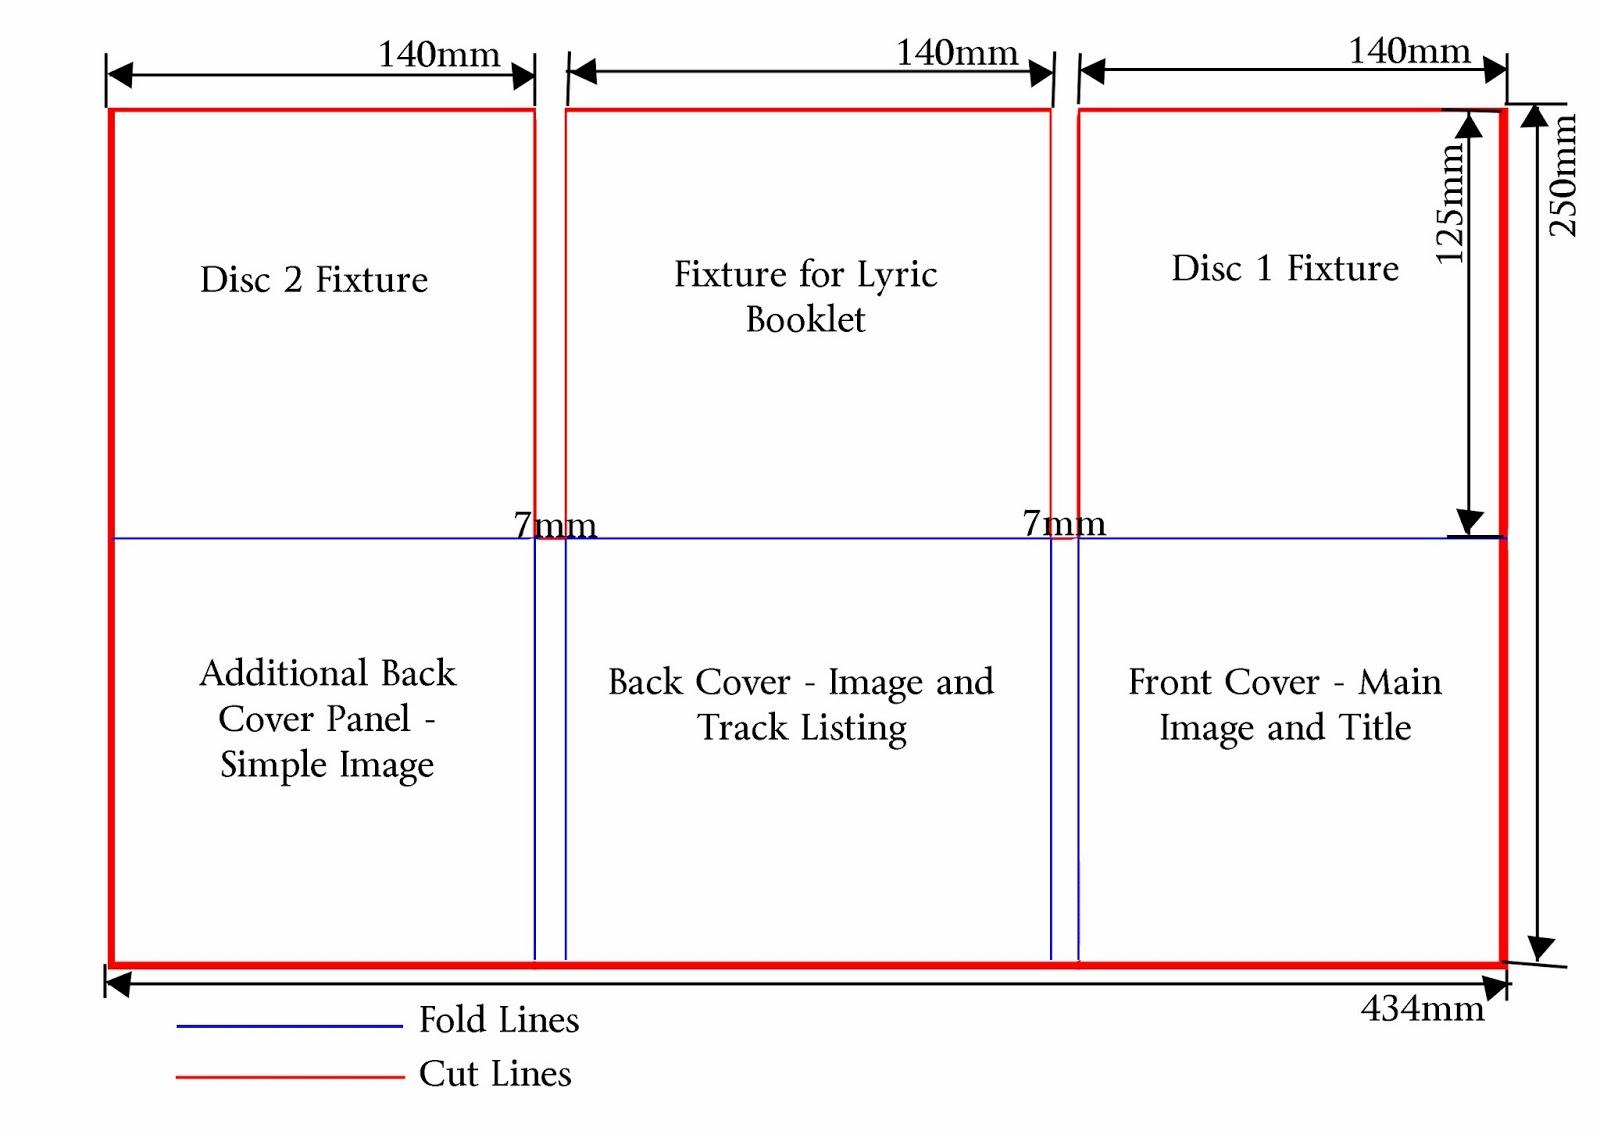 cd dimensions template - lauren barrett 5136 g324 advanced portfolio digipak